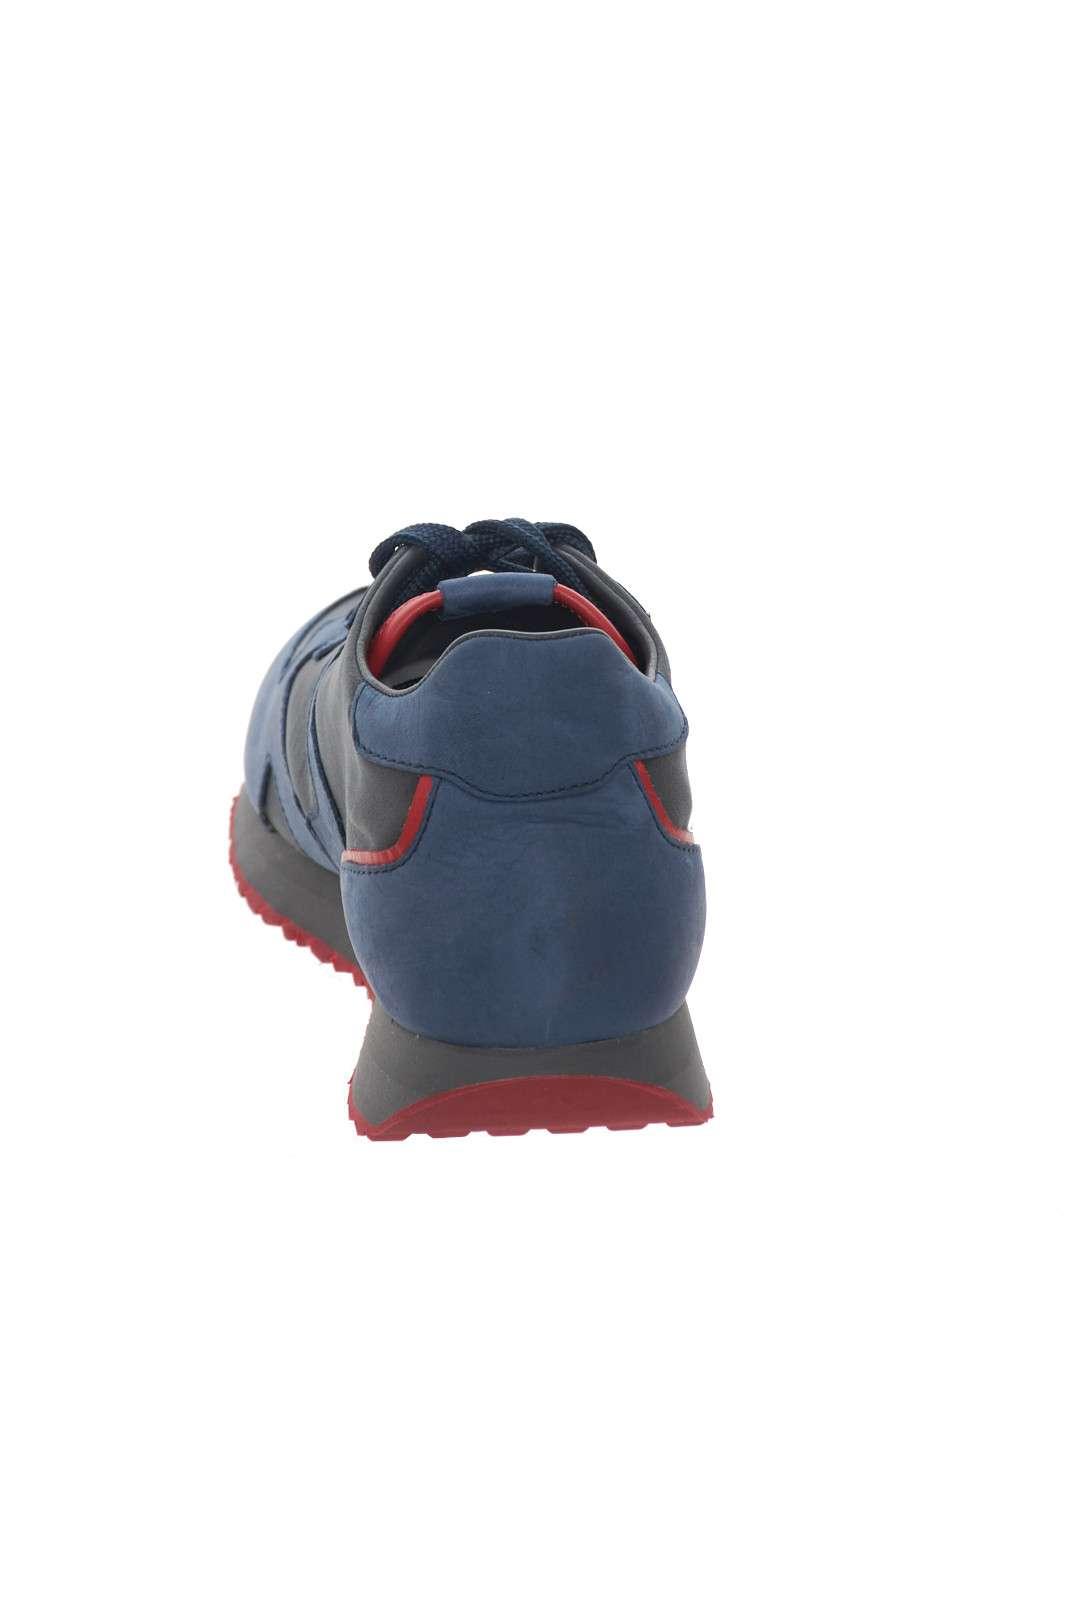 https://www.parmax.com/media/catalog/product/a/i/AI-outlet_parmax-scarpe-uomo-Guardiani-Sport-SU71391C-C.jpg